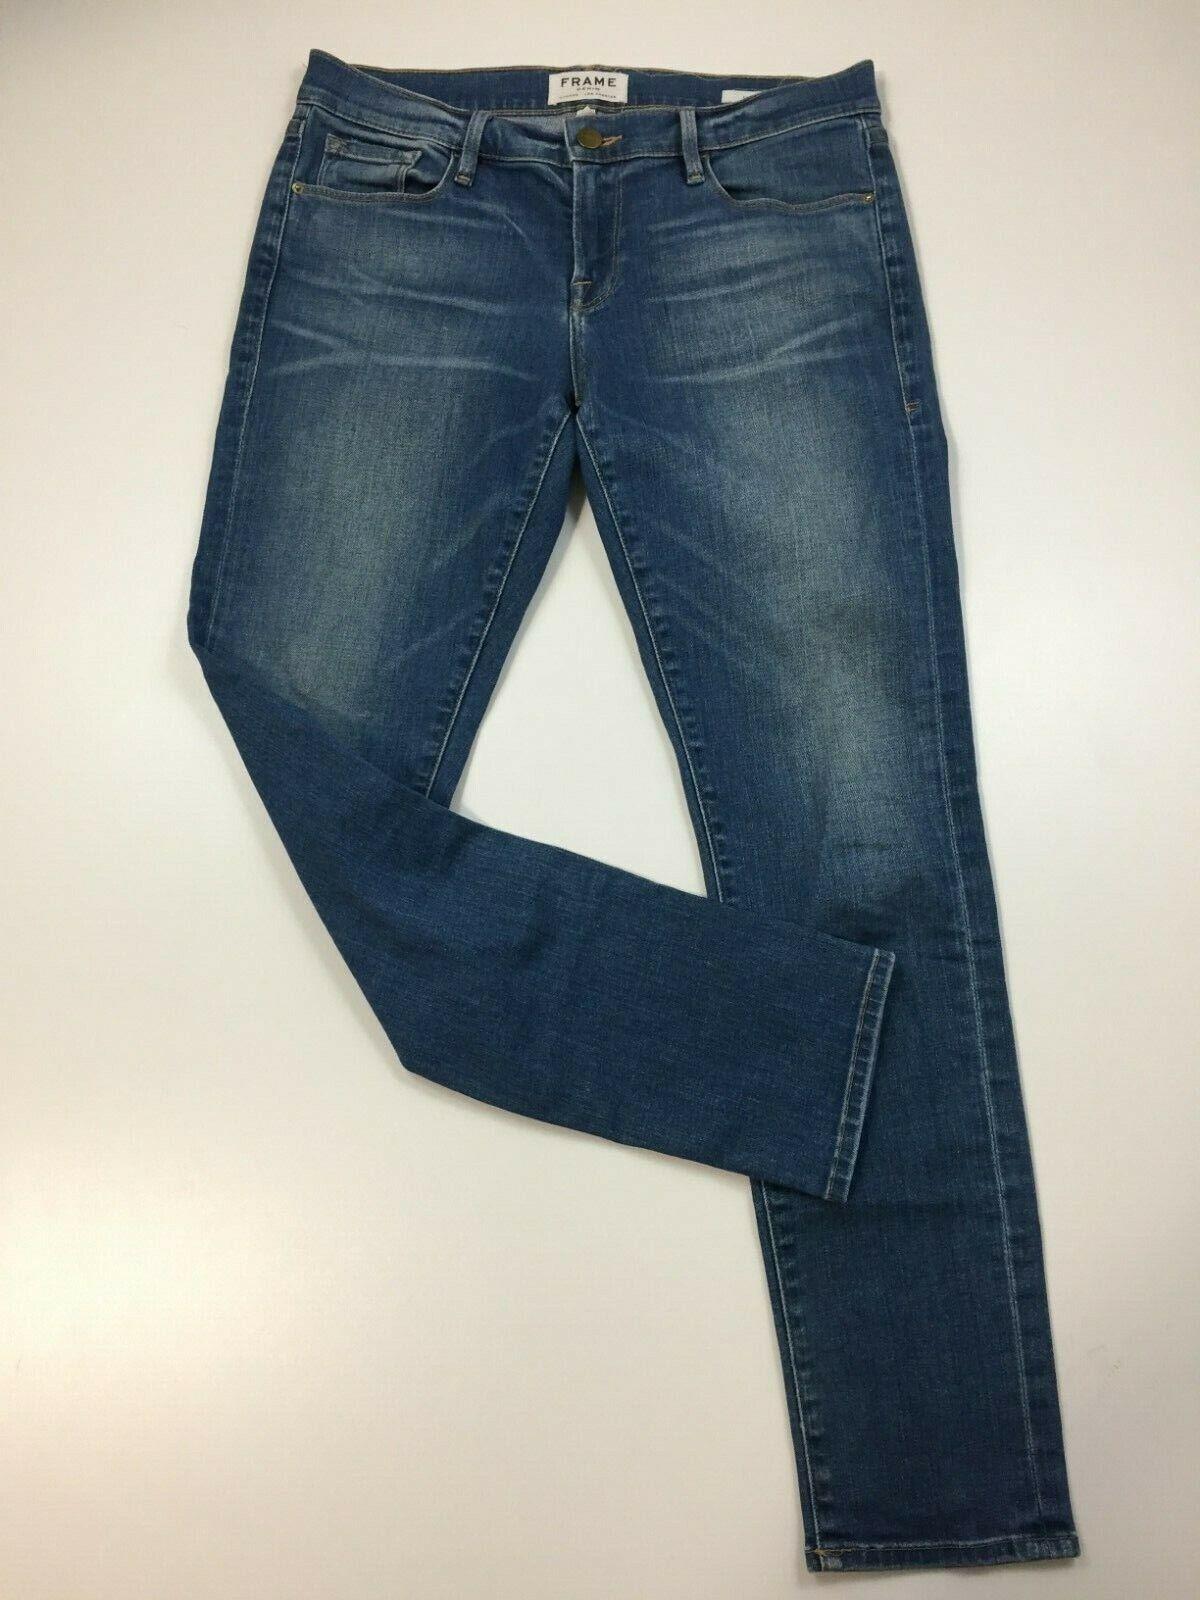 FRAME DENIM damen Sz 26 Medium Wash LE GARCON Logo Hardware Jeans